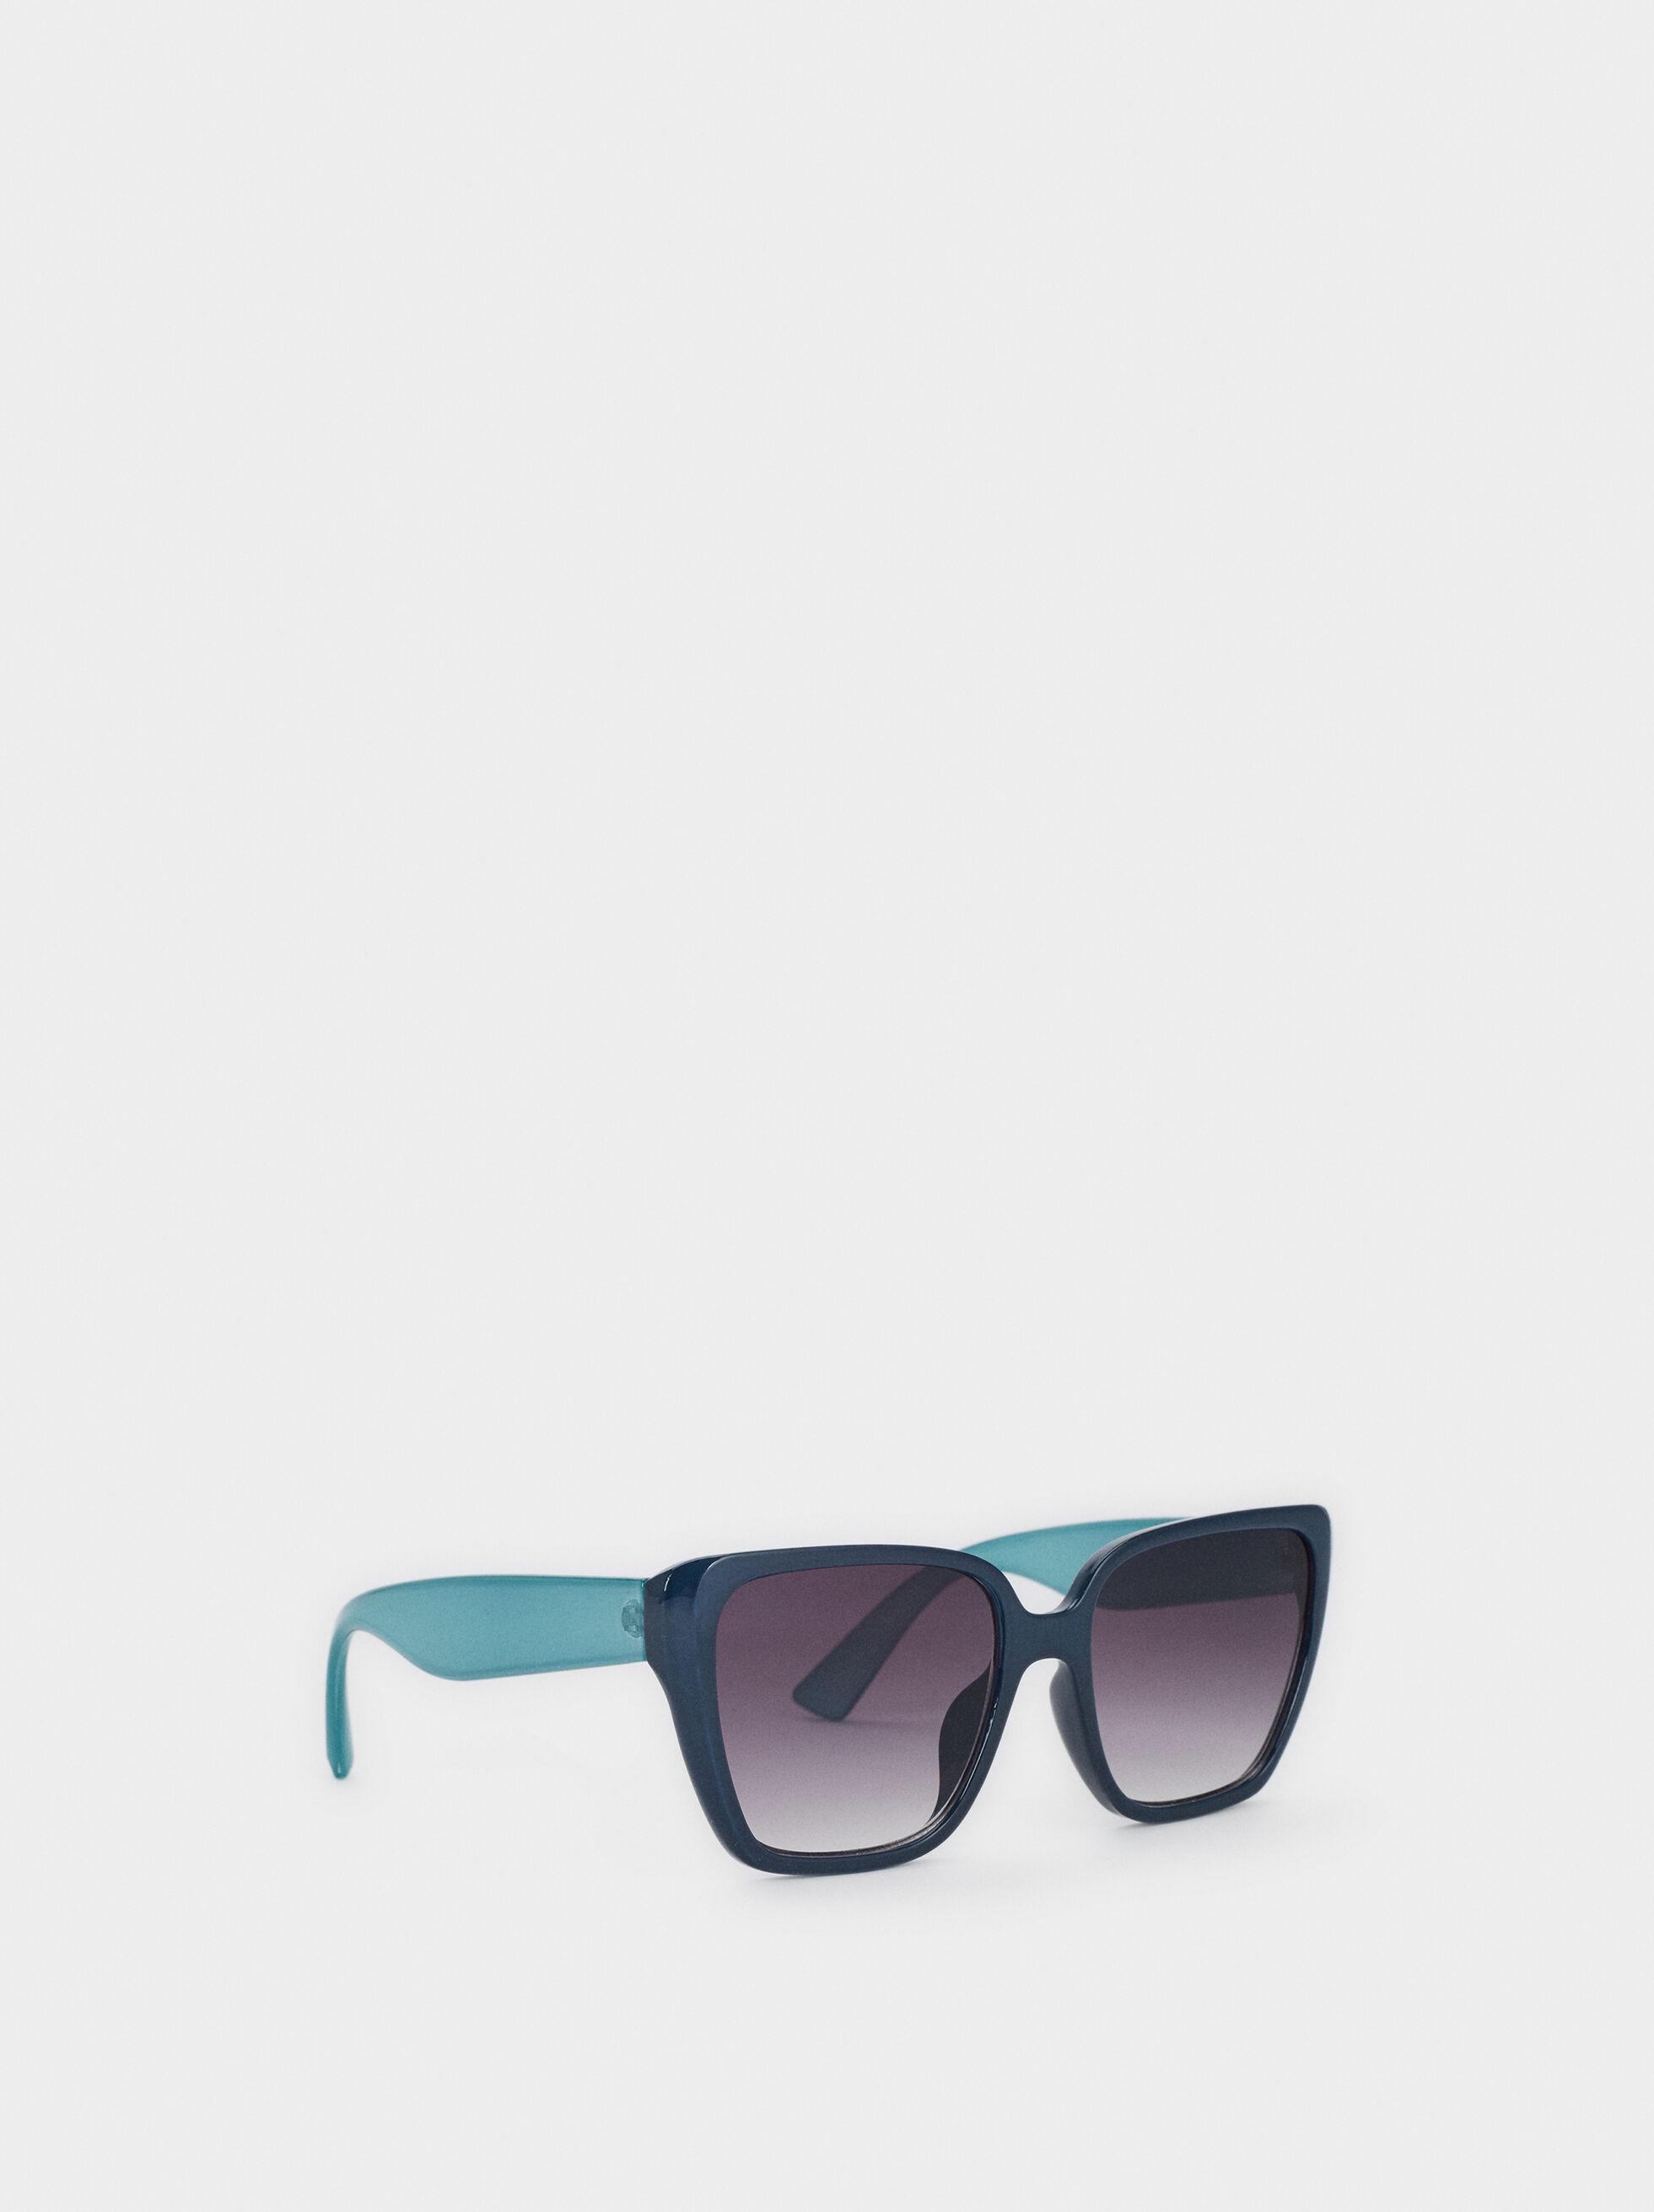 Resin Sunglasses, Blue, hi-res